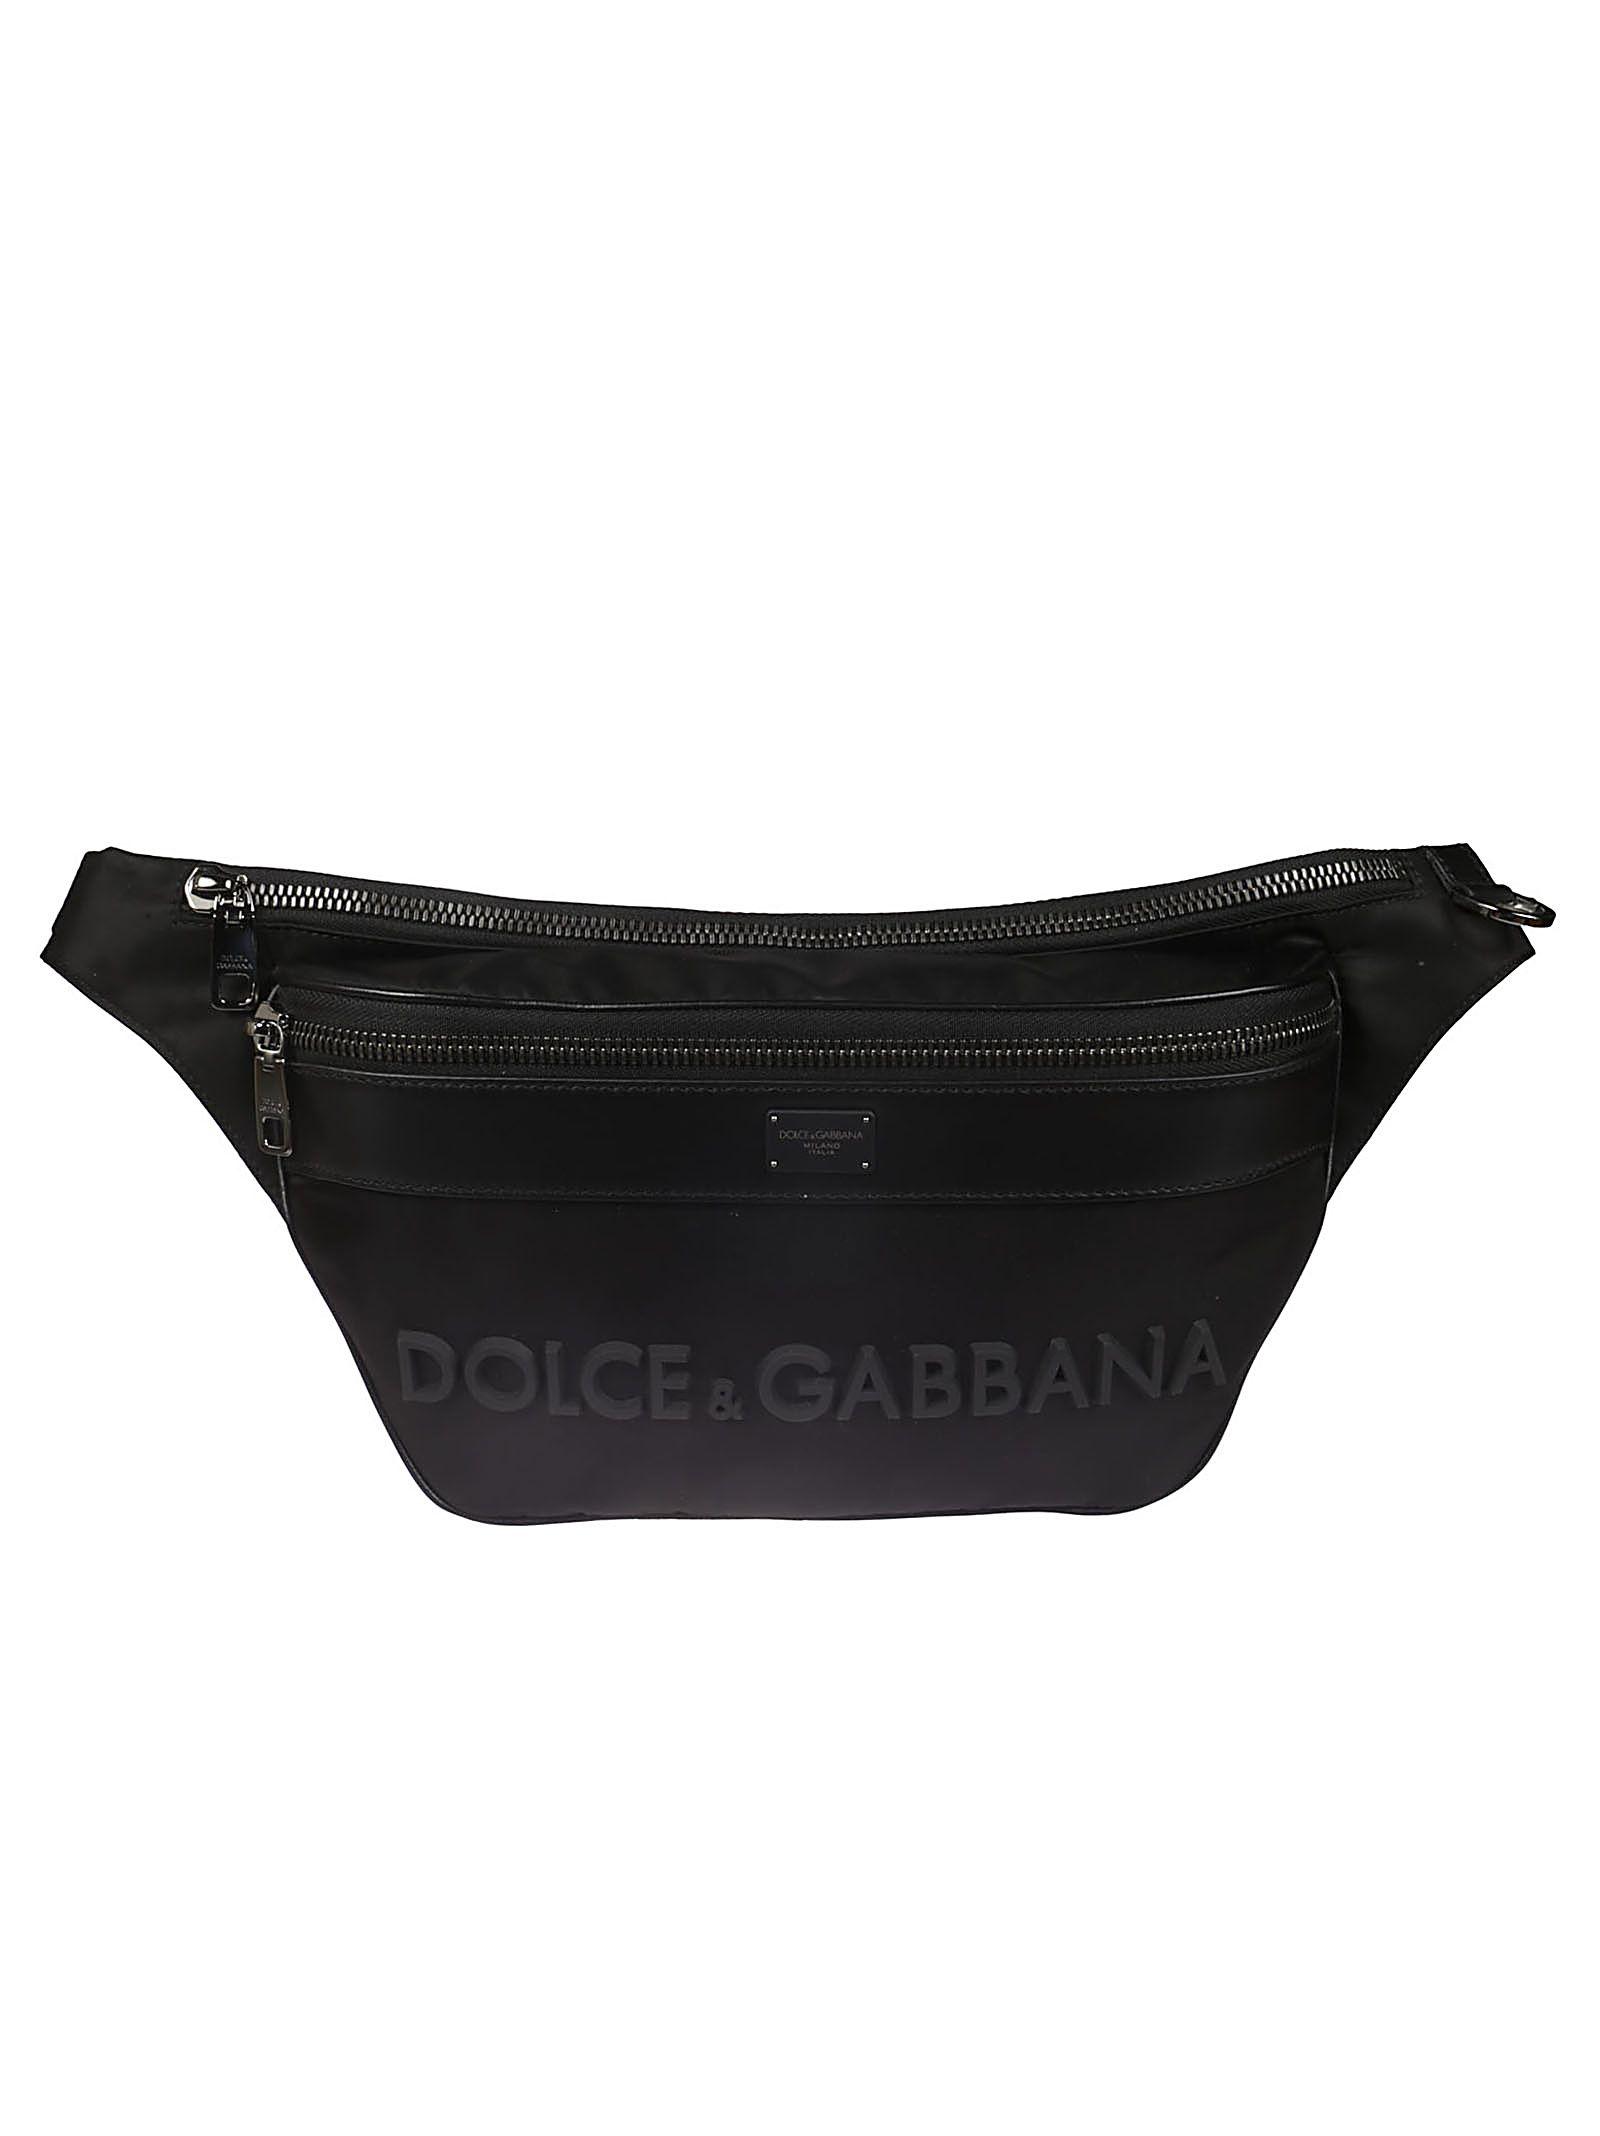 e93edb38083a Dolce   Gabbana Dolce   Gabbana Trim Sling Bag - Black - 10805776 ...